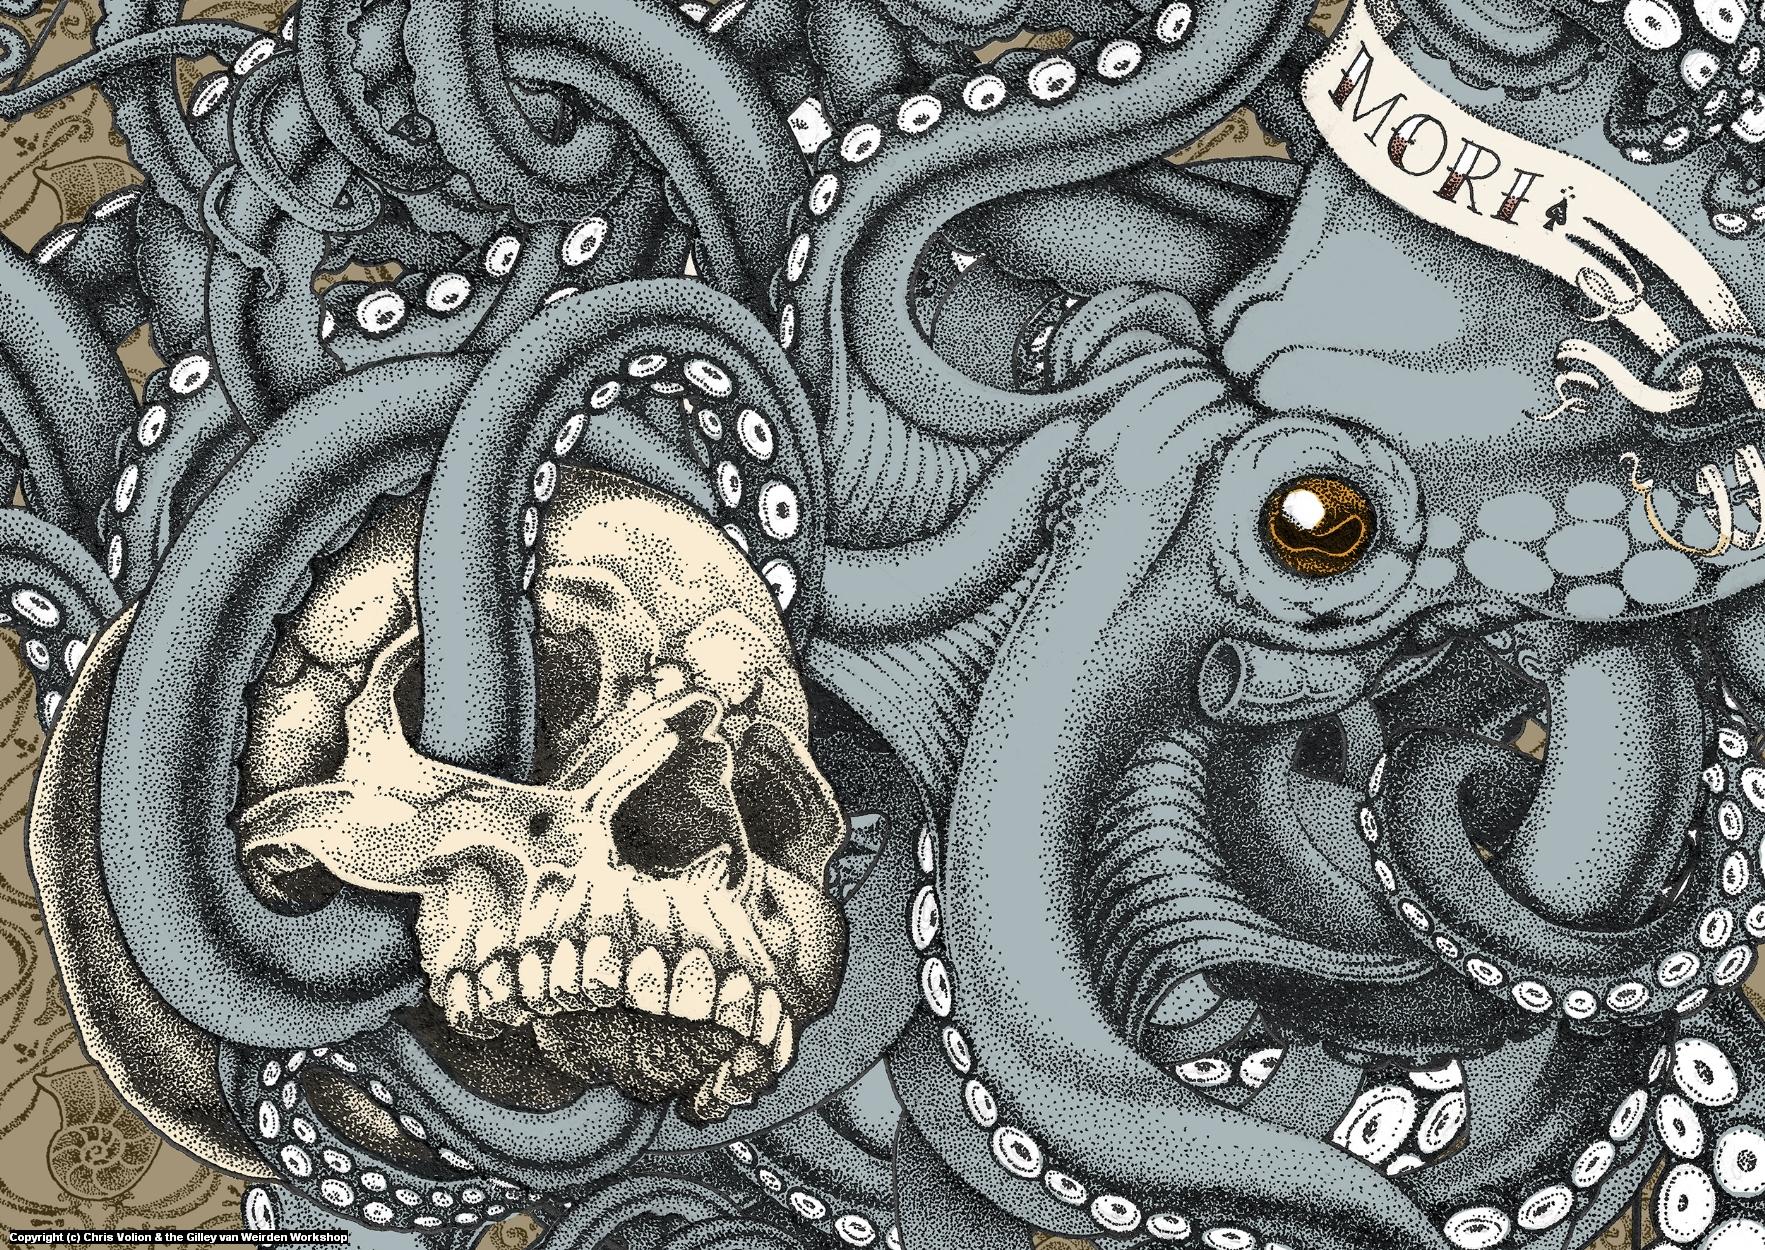 Tempus Fugit (Memento Mori) Artwork by Chris Volion